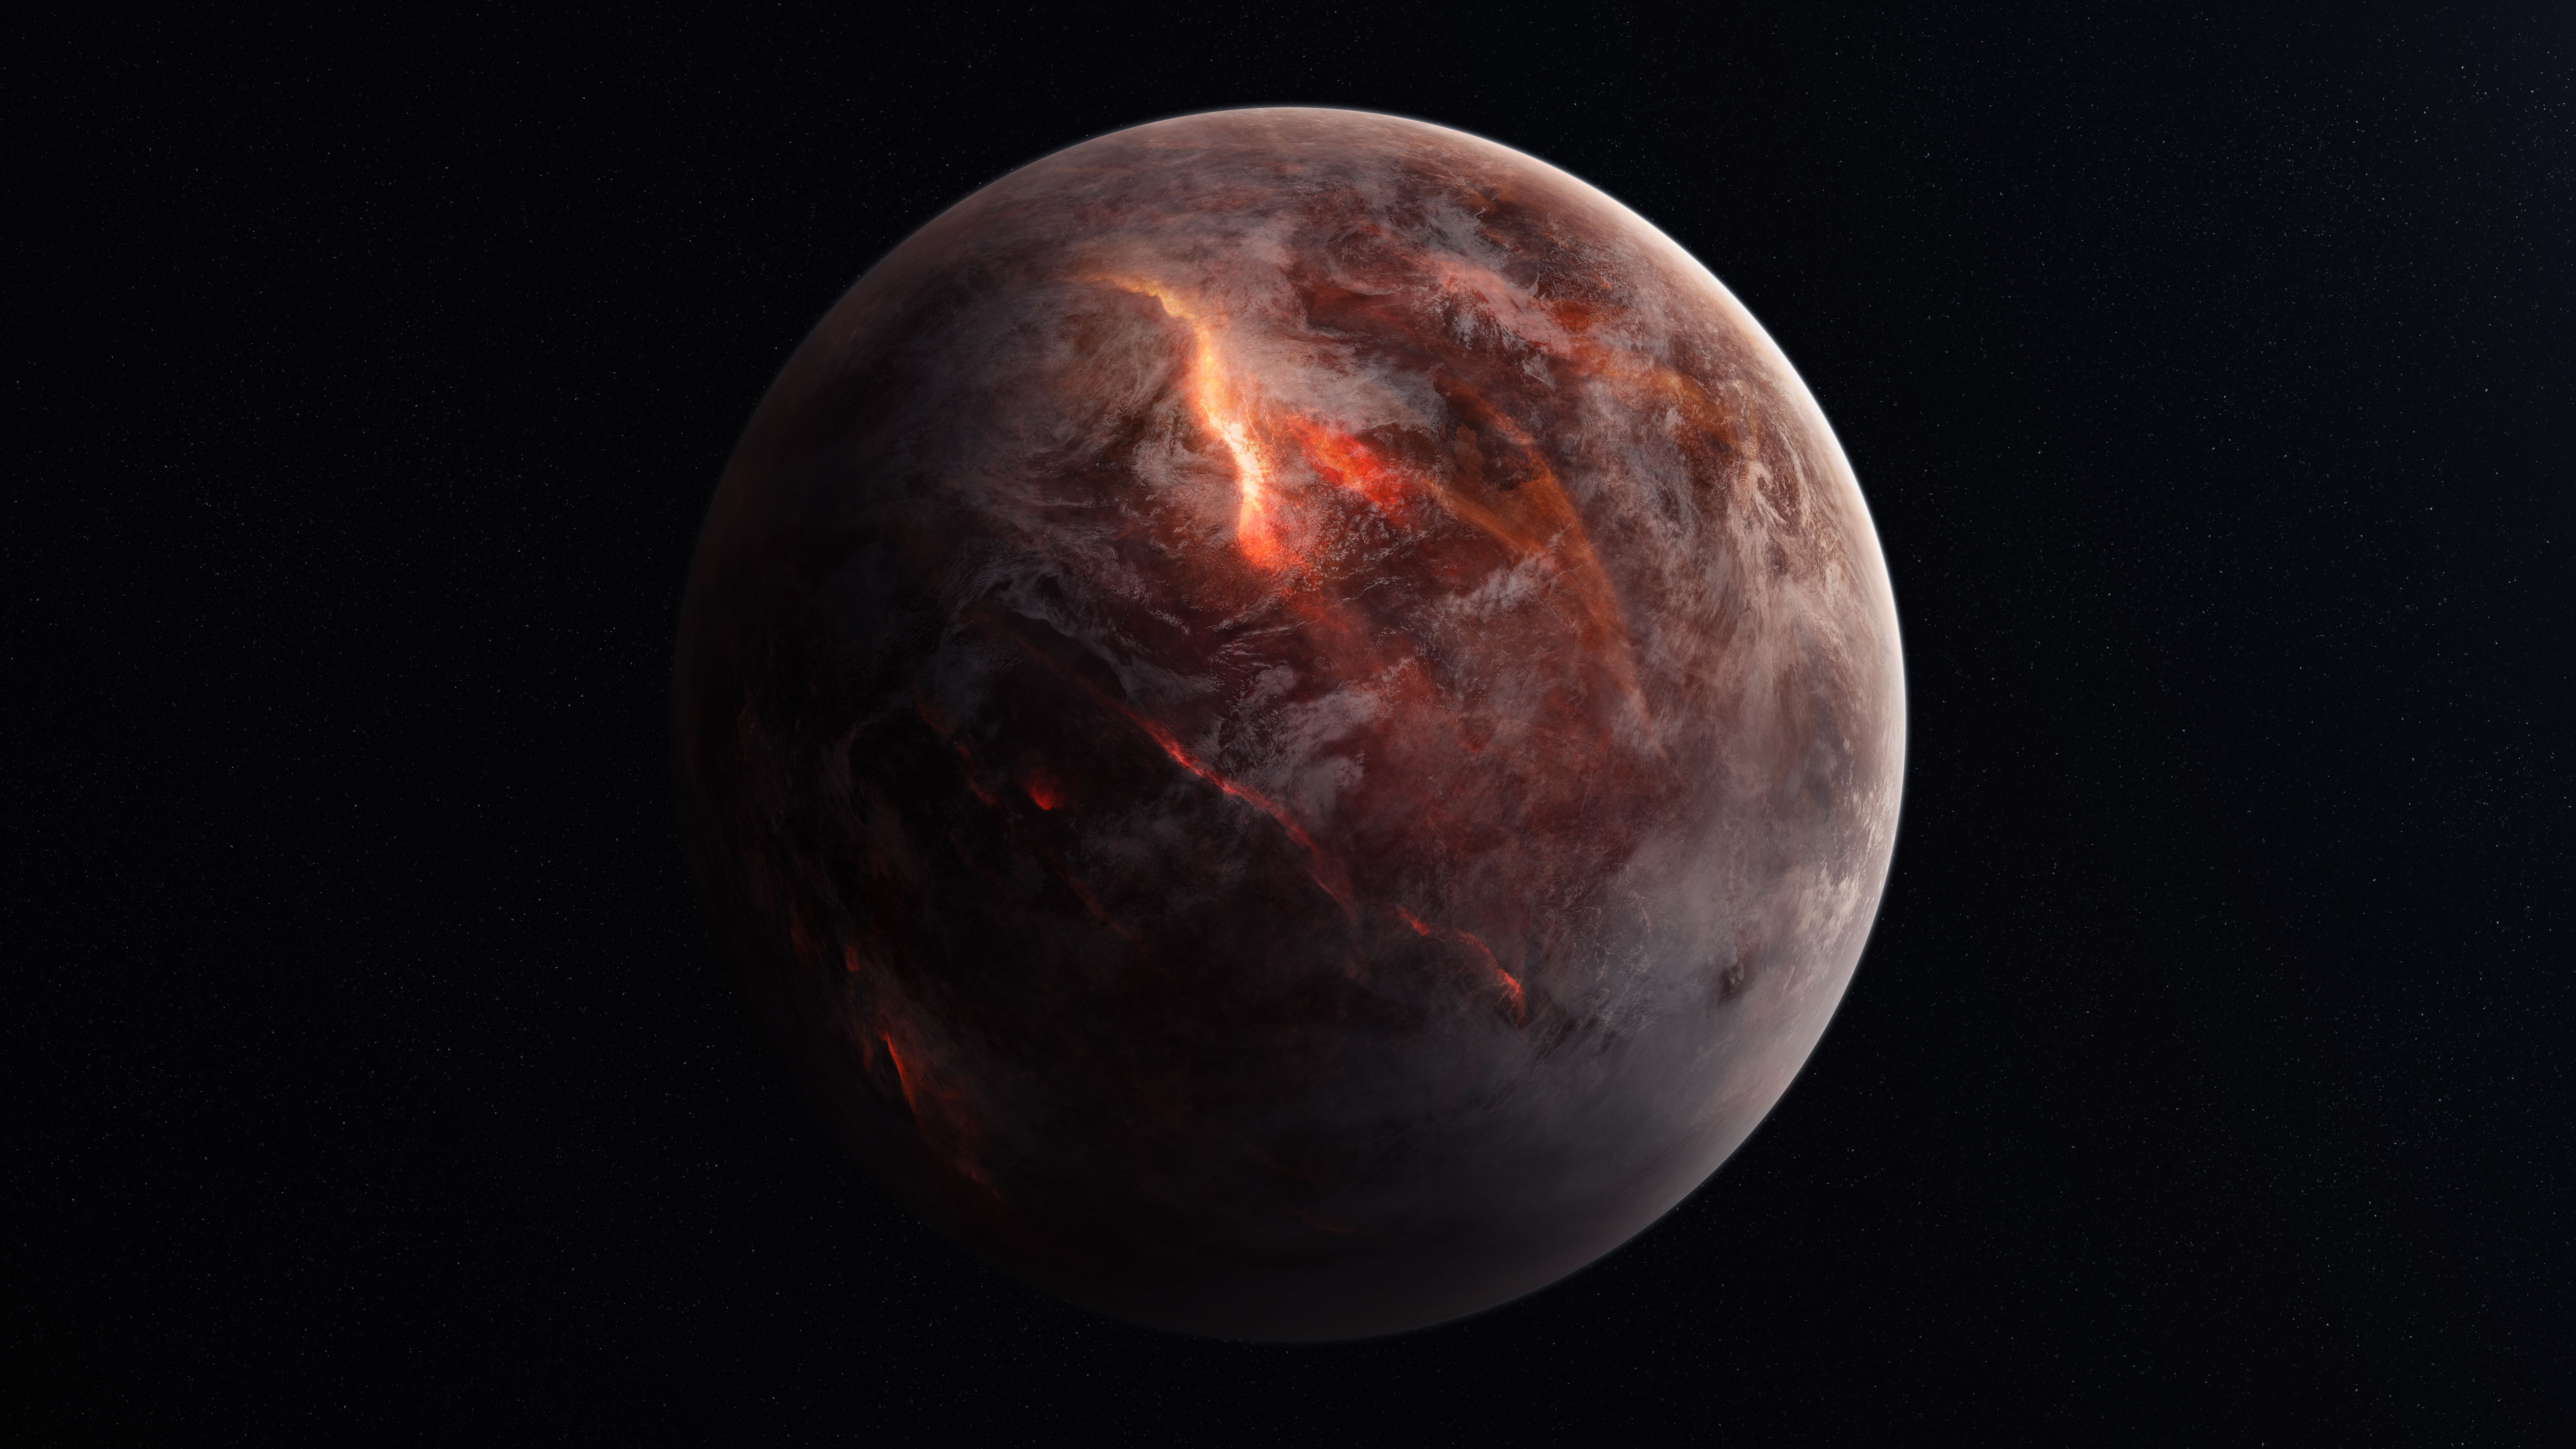 7680x4320 كوكب خلفية ، تدمير ، 4K ، 8K ، مسافة